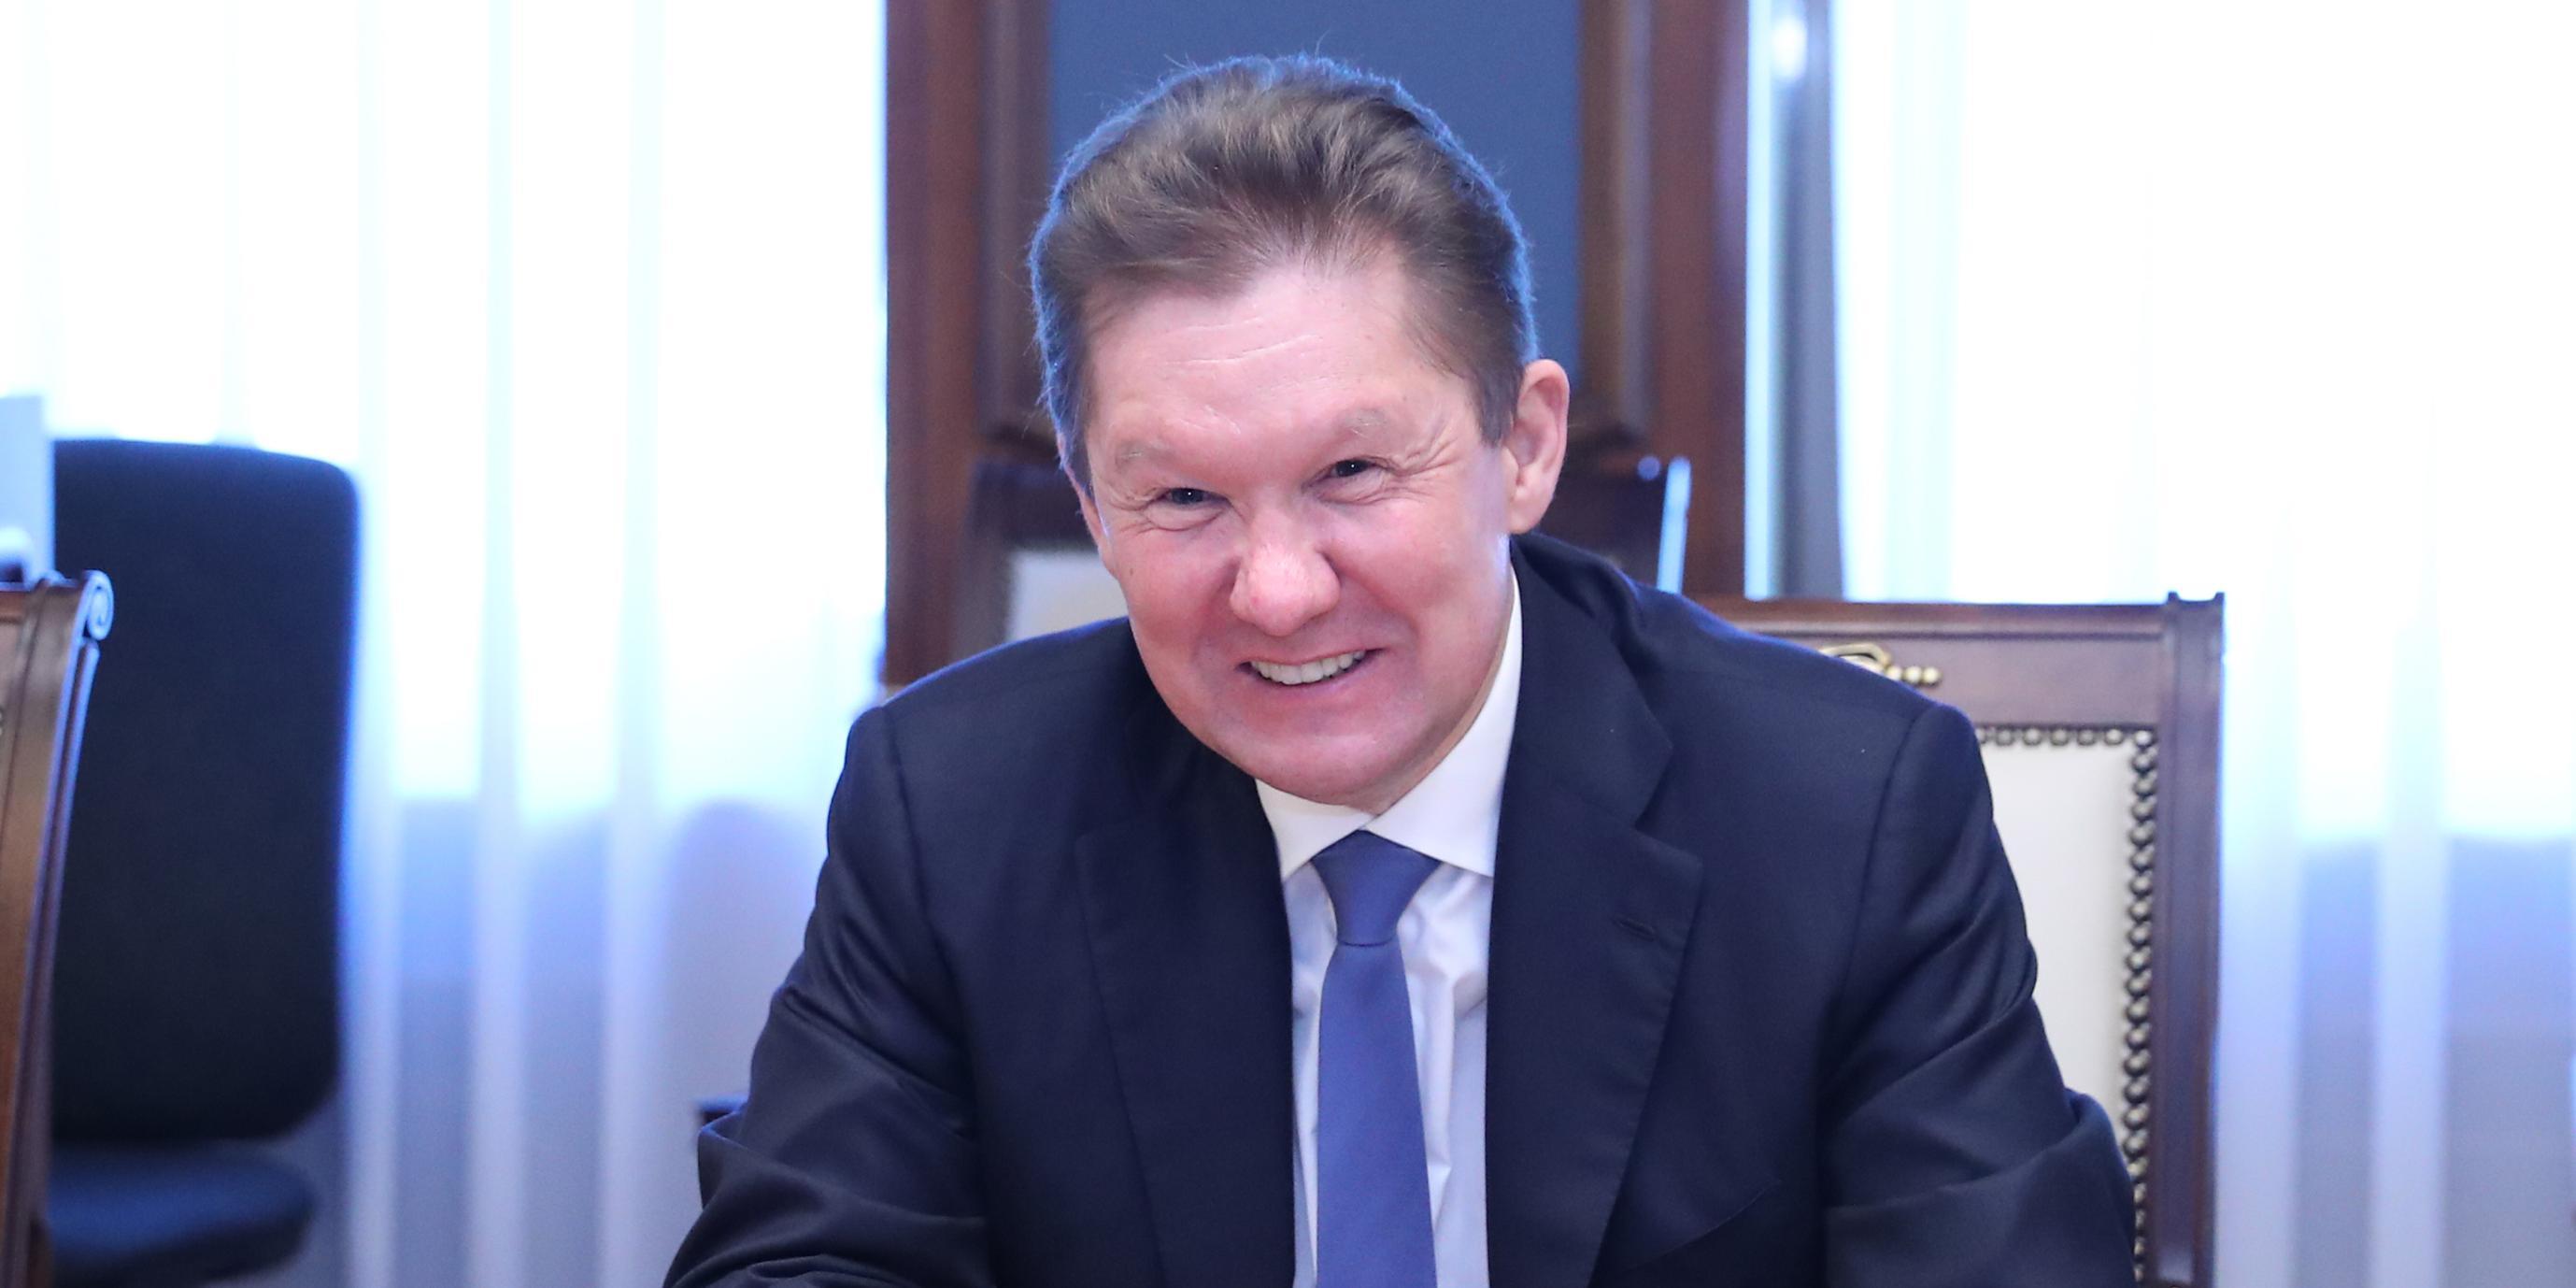 На Украине после 1 января будет весело, заявил Миллер